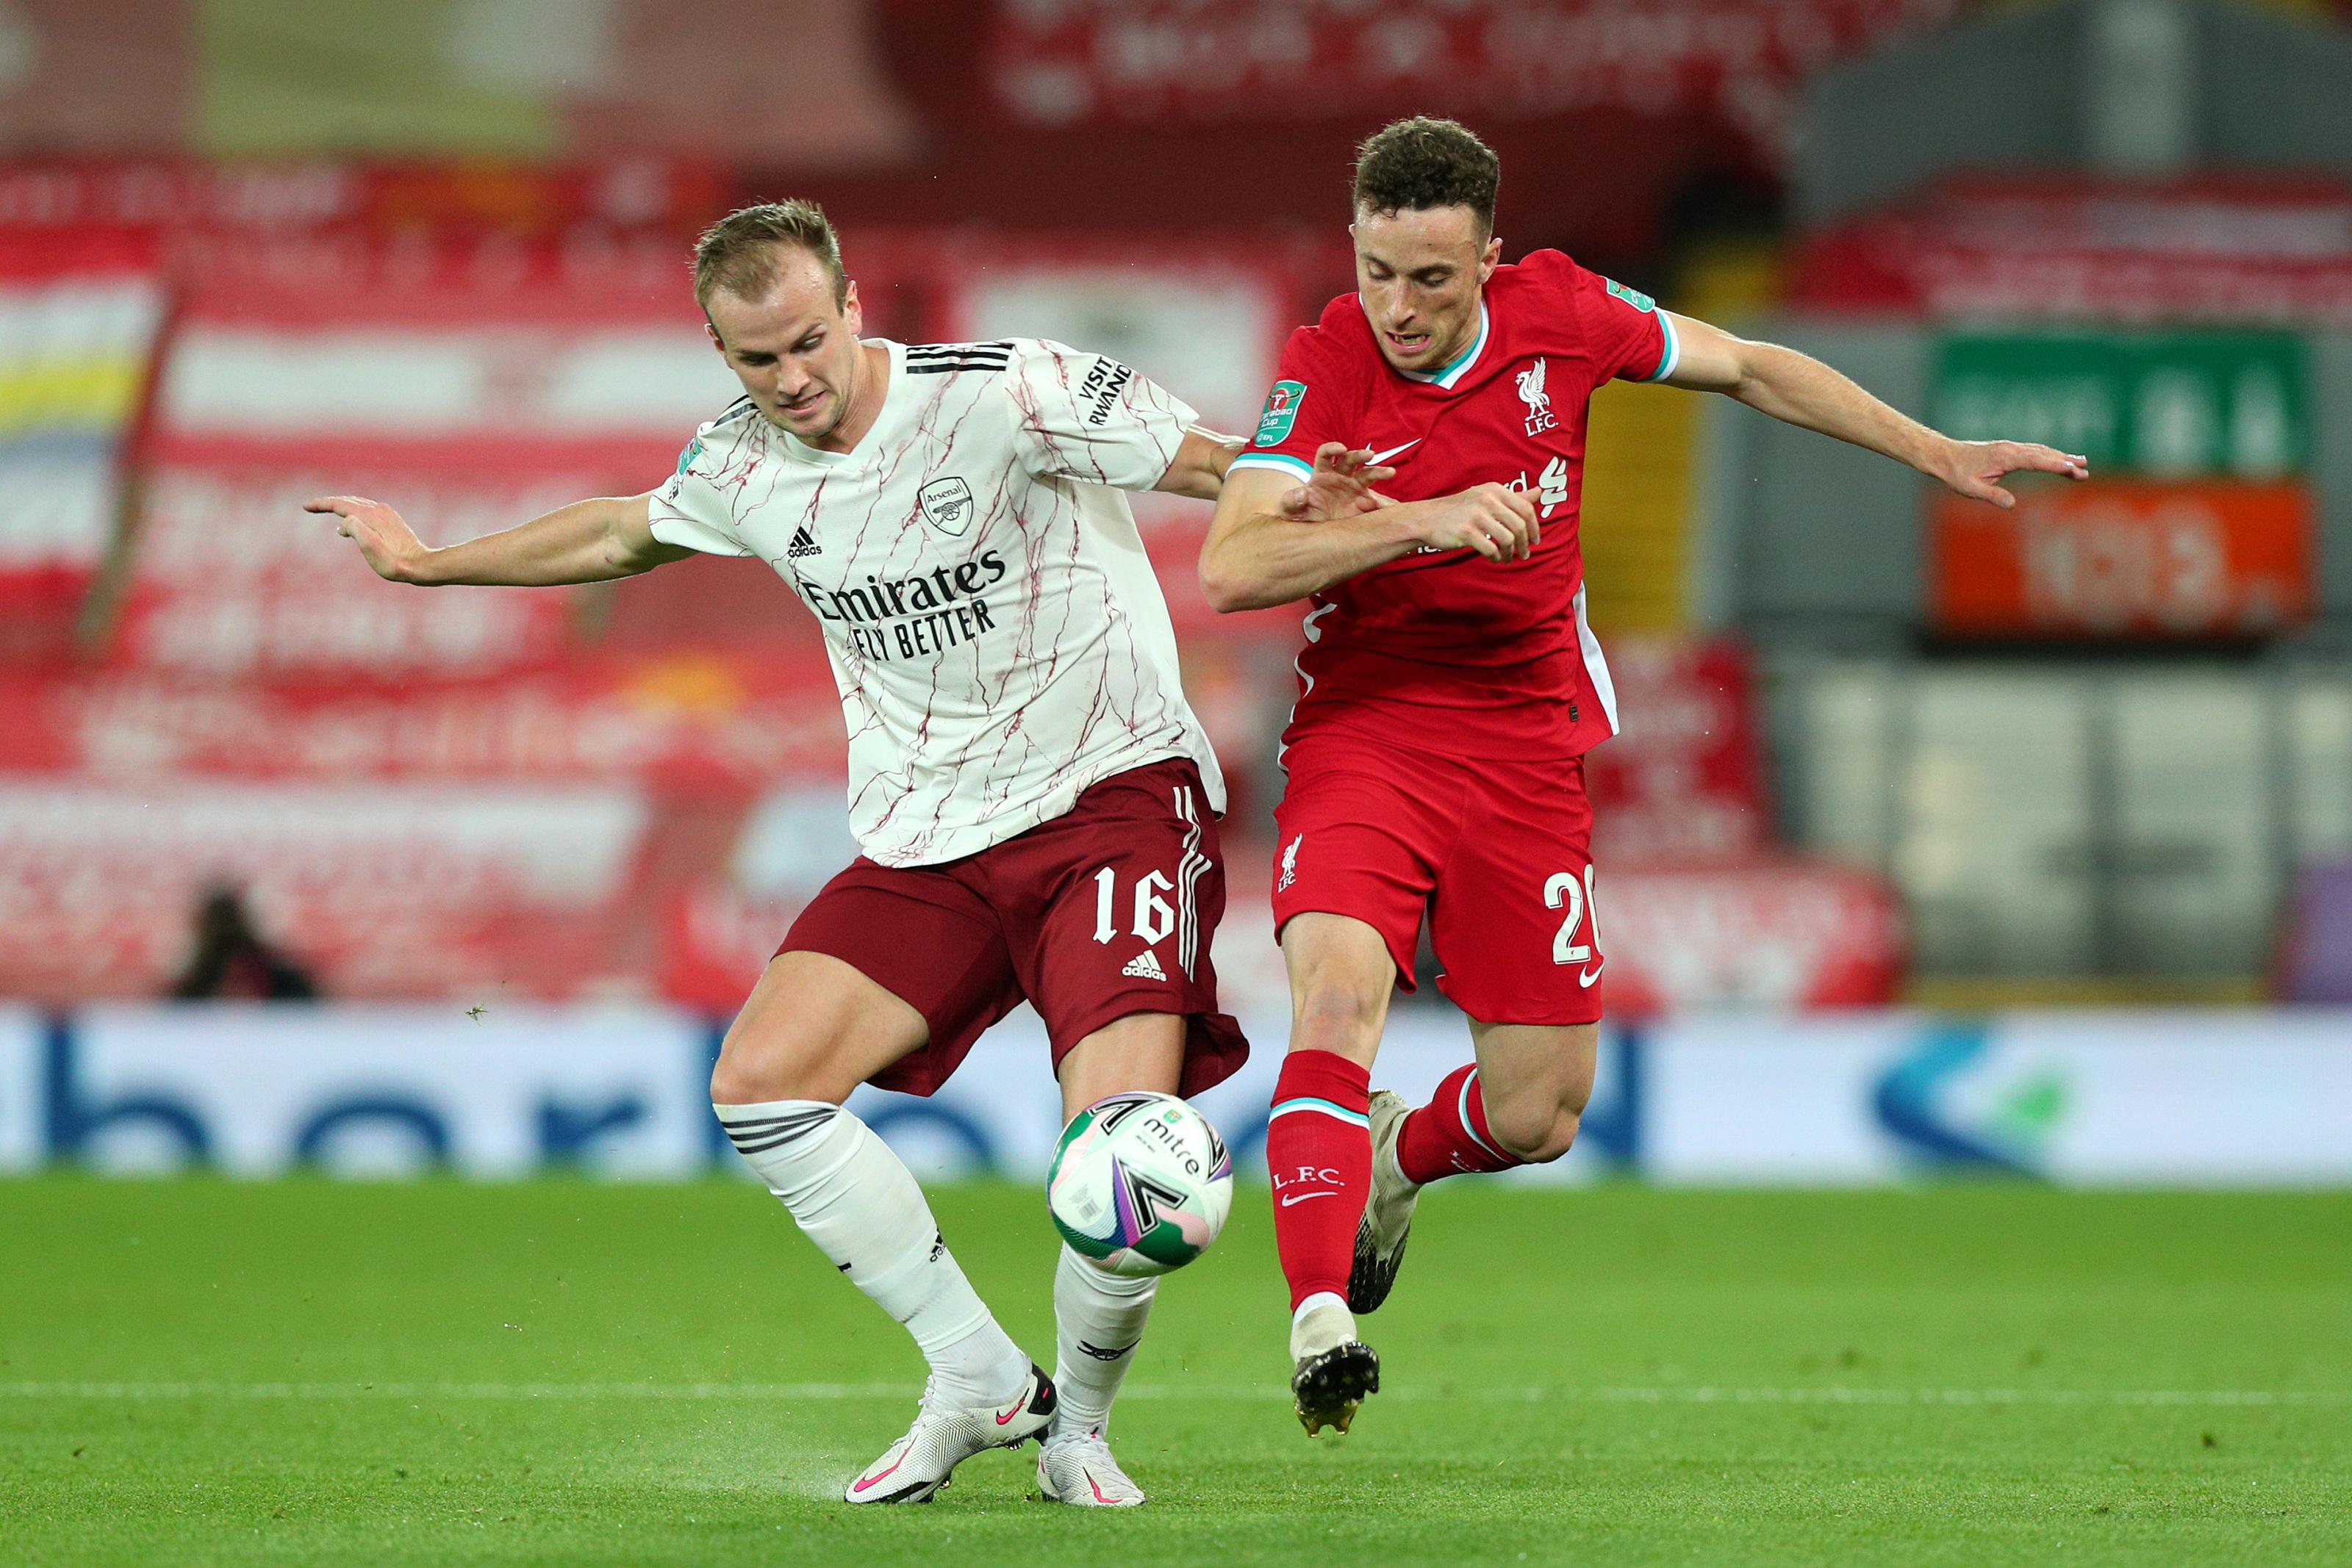 Free Liverpool Live Stream Vs Aston Villa Watch Diogo Jota On Full Debut